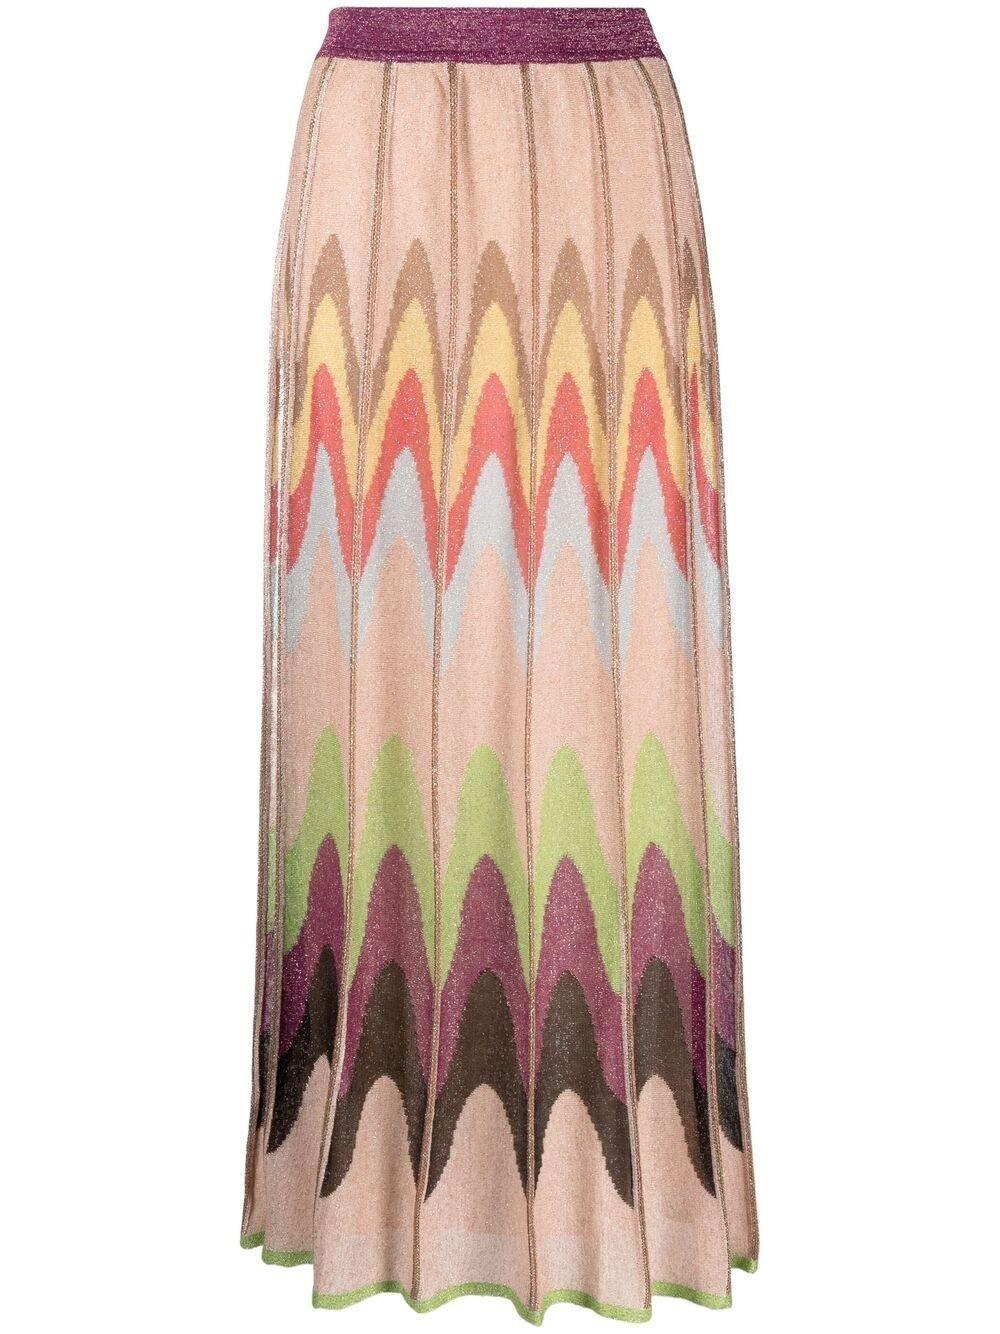 Long Multicolor Skirt in Viscose blend